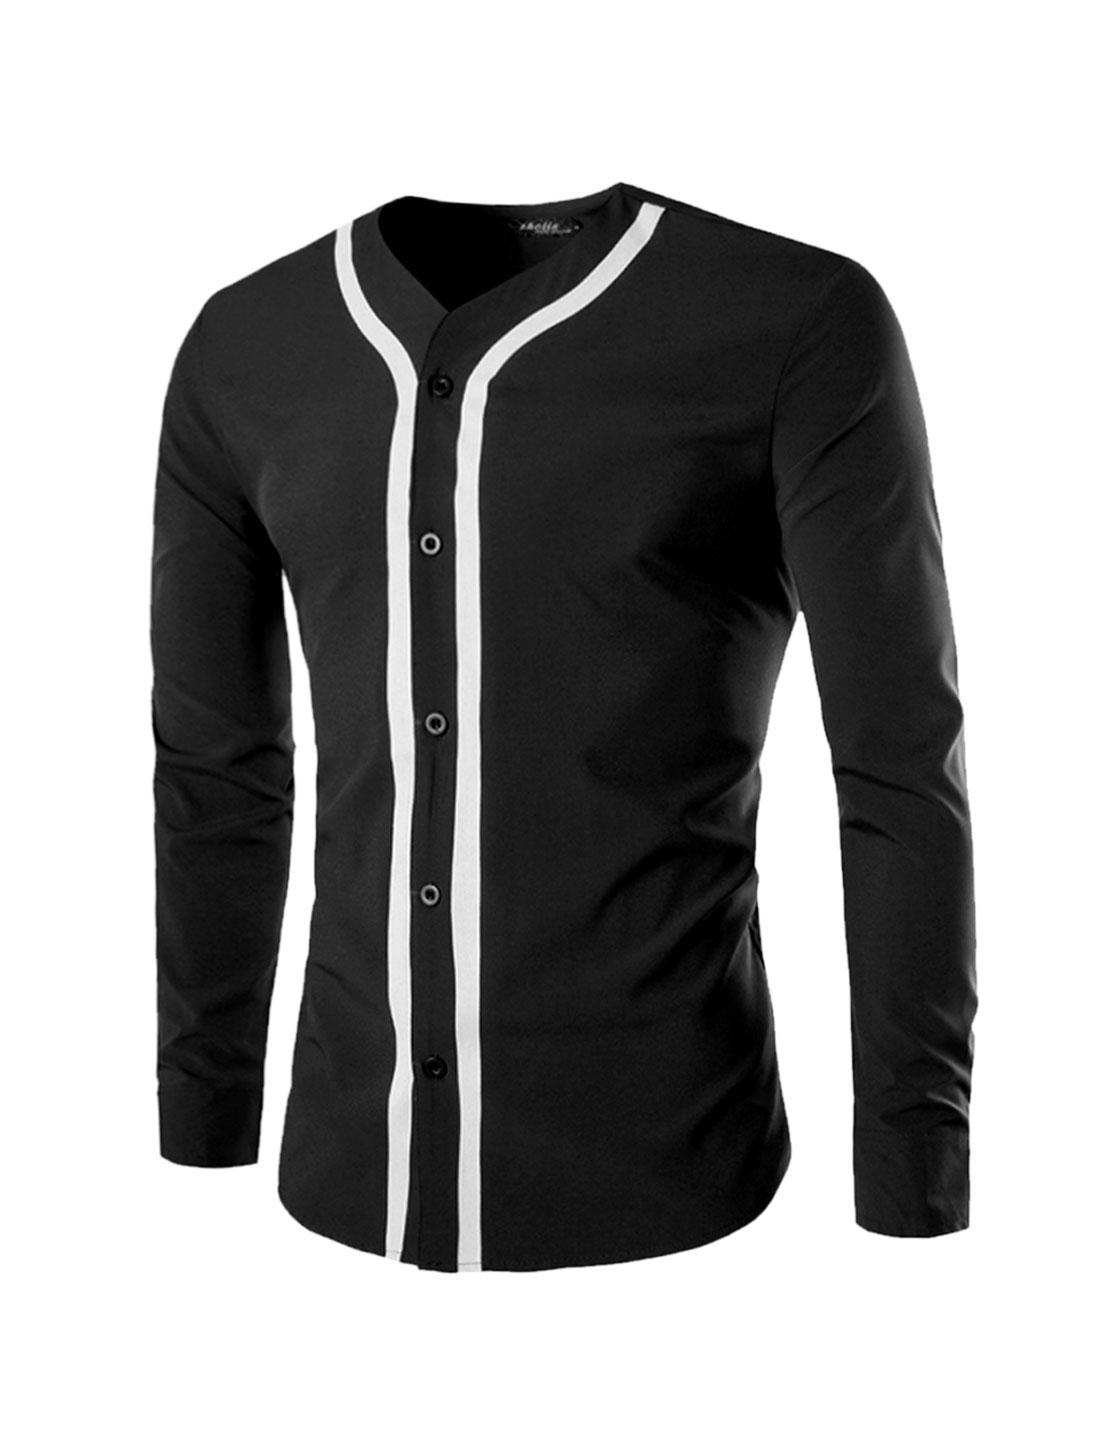 Men Long Sleeves Contrast Color Button Front Casual Shirt Black M